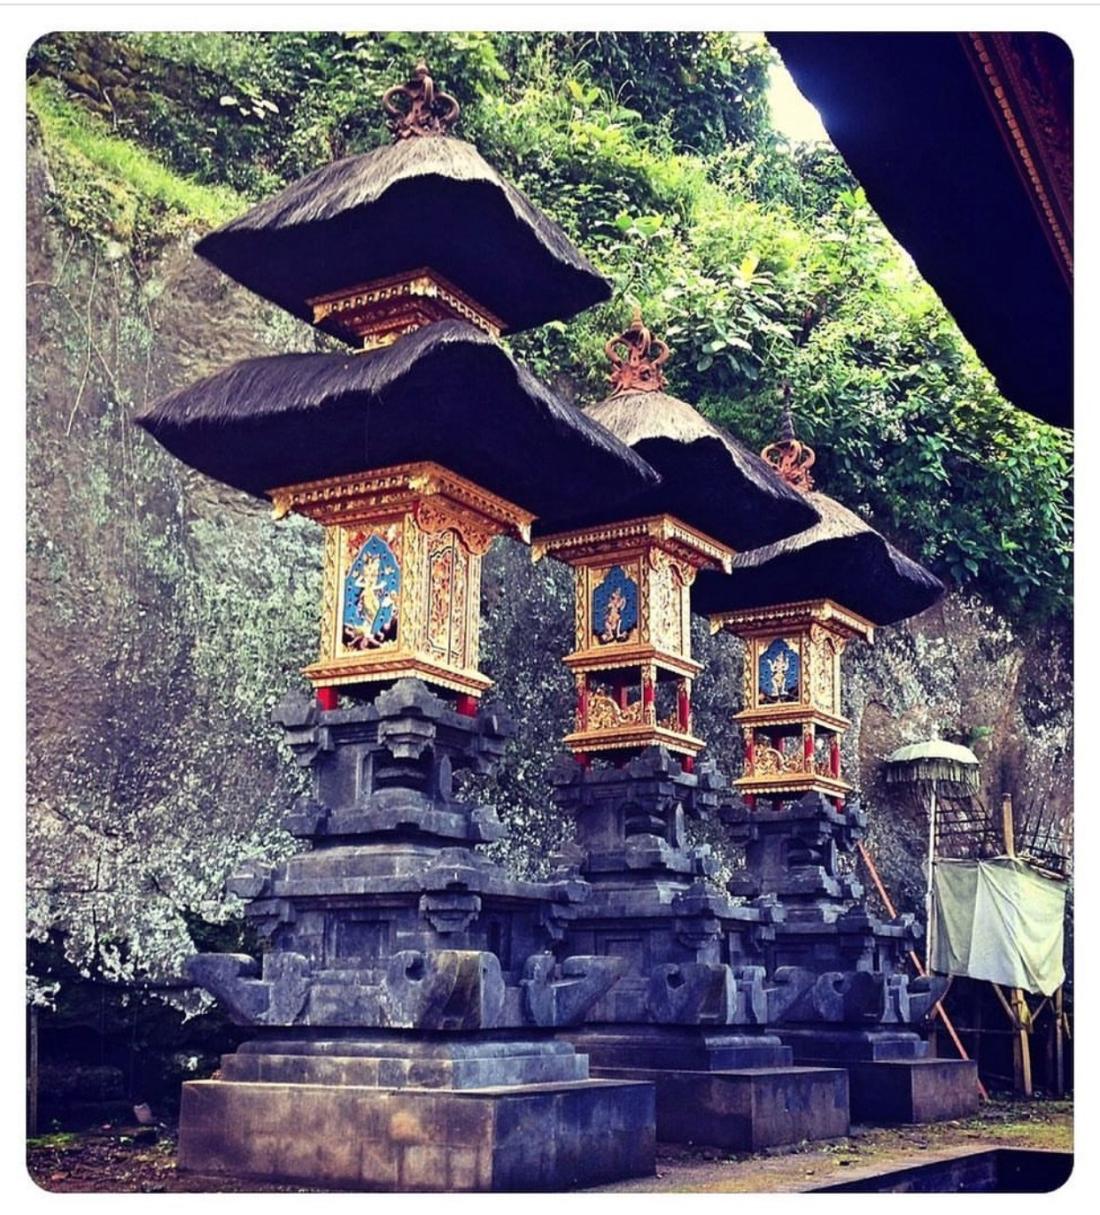 Goa-Gajah (Elephant Cave) Temple Grounds